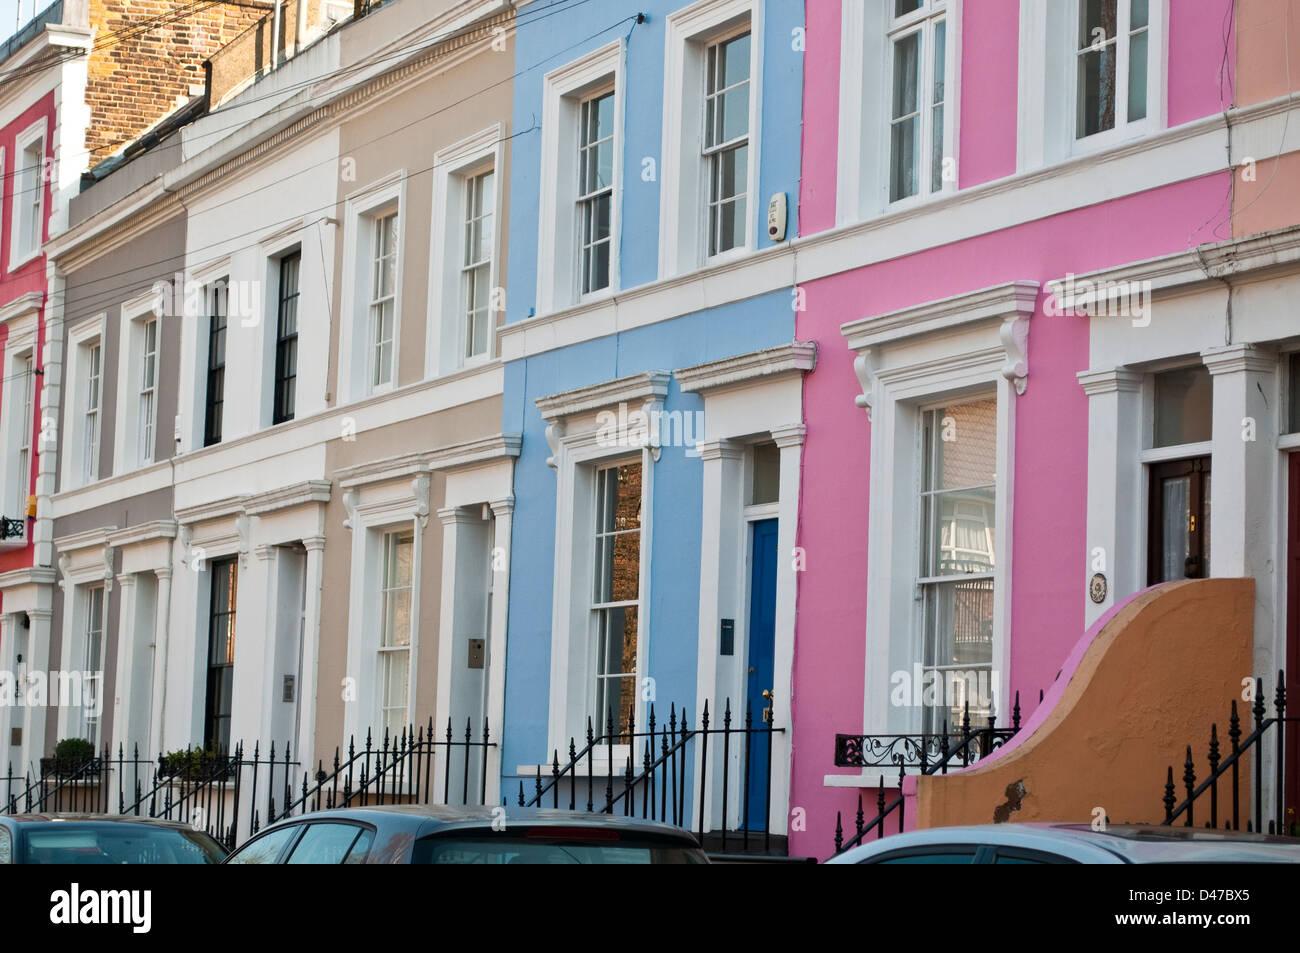 Terraced houses, Notting Hill, London, W11, UK - Stock Image